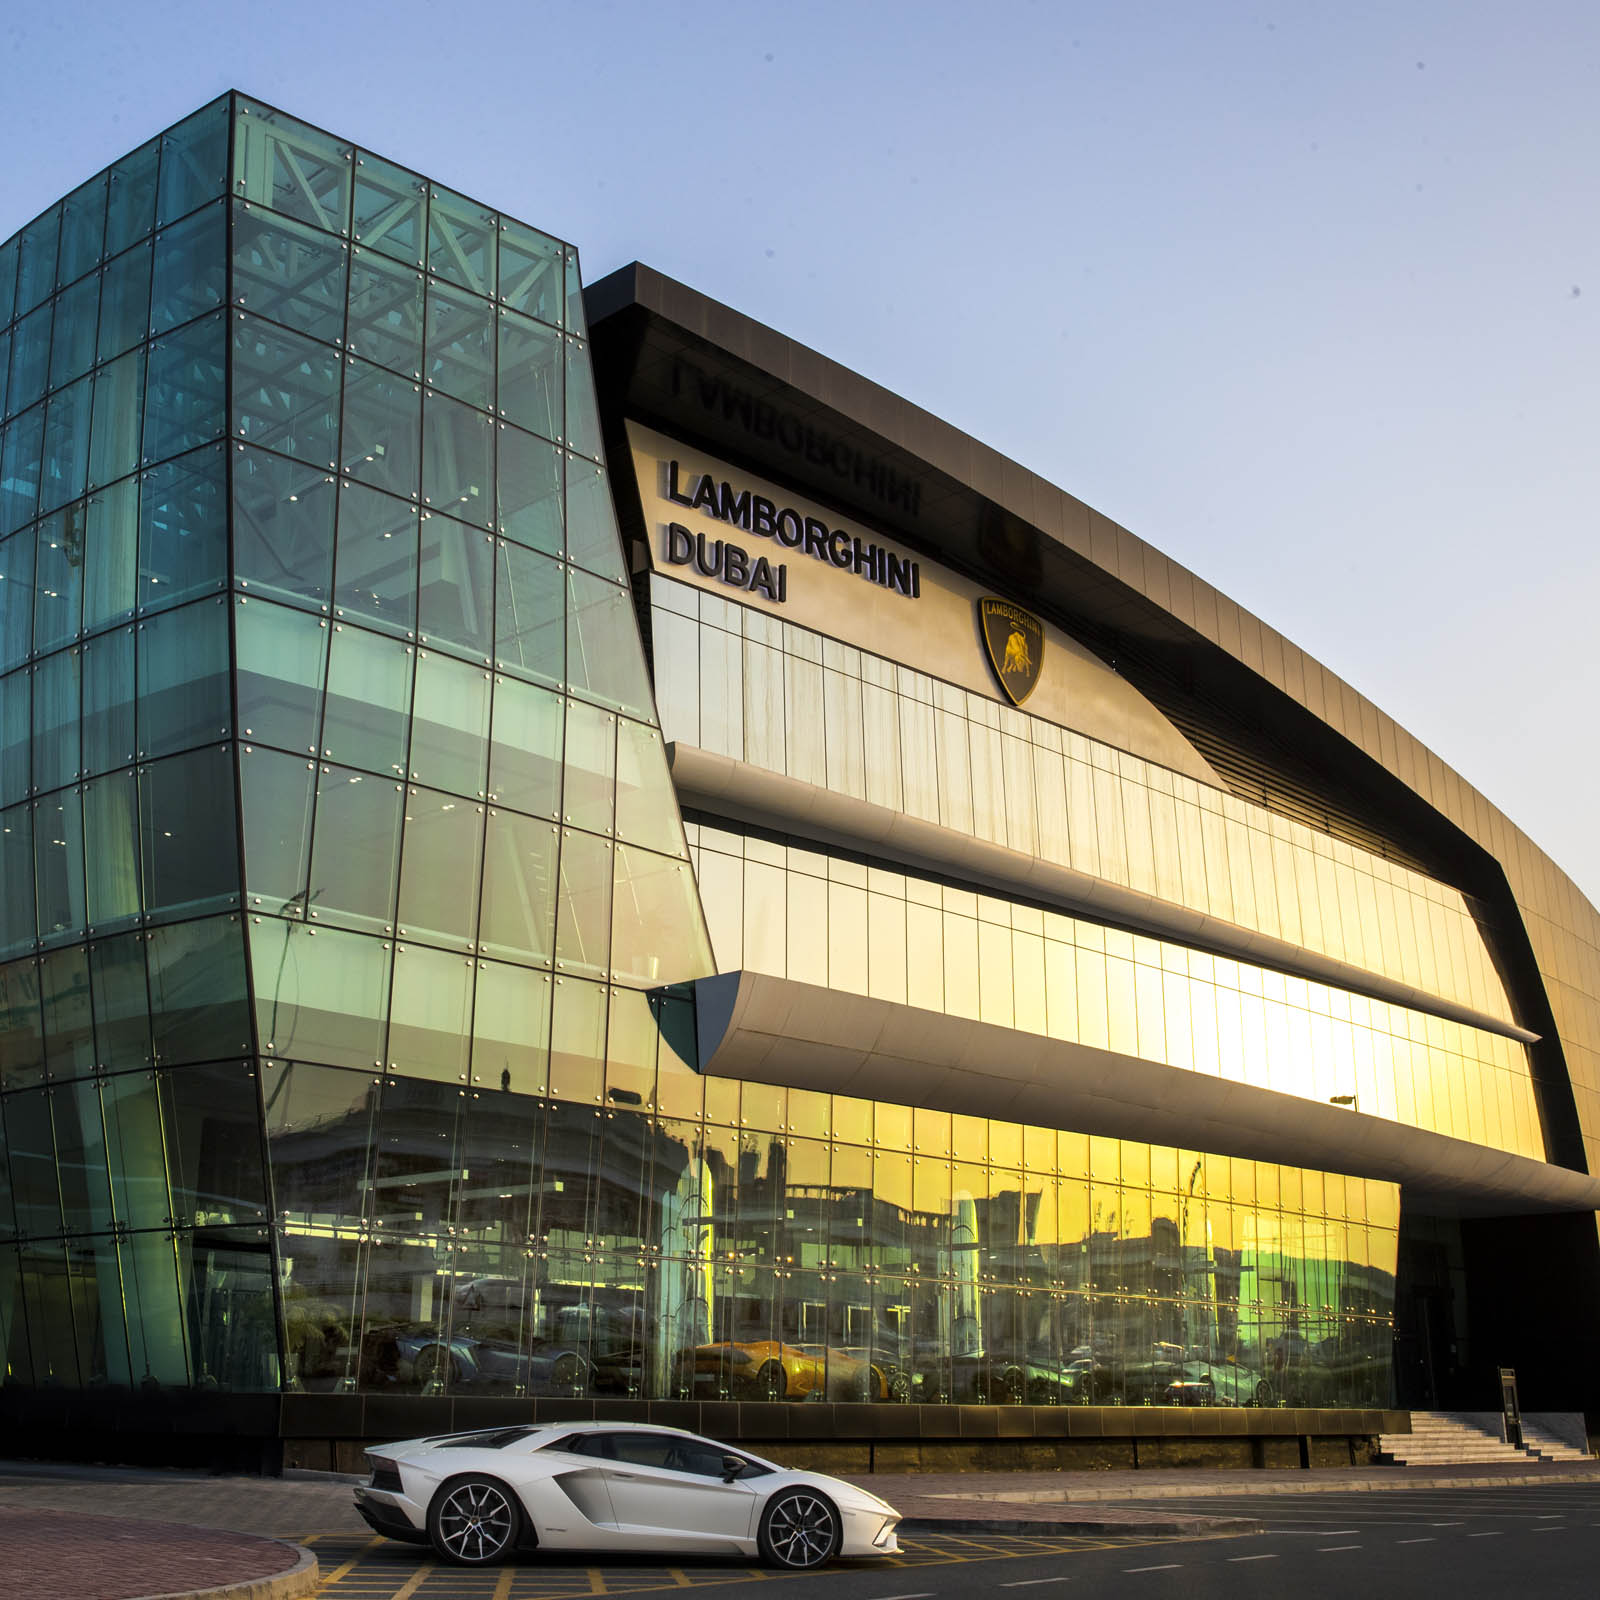 Lamborghini Dealership: Lamborghini Just Opened Its Largest Showroom Yet